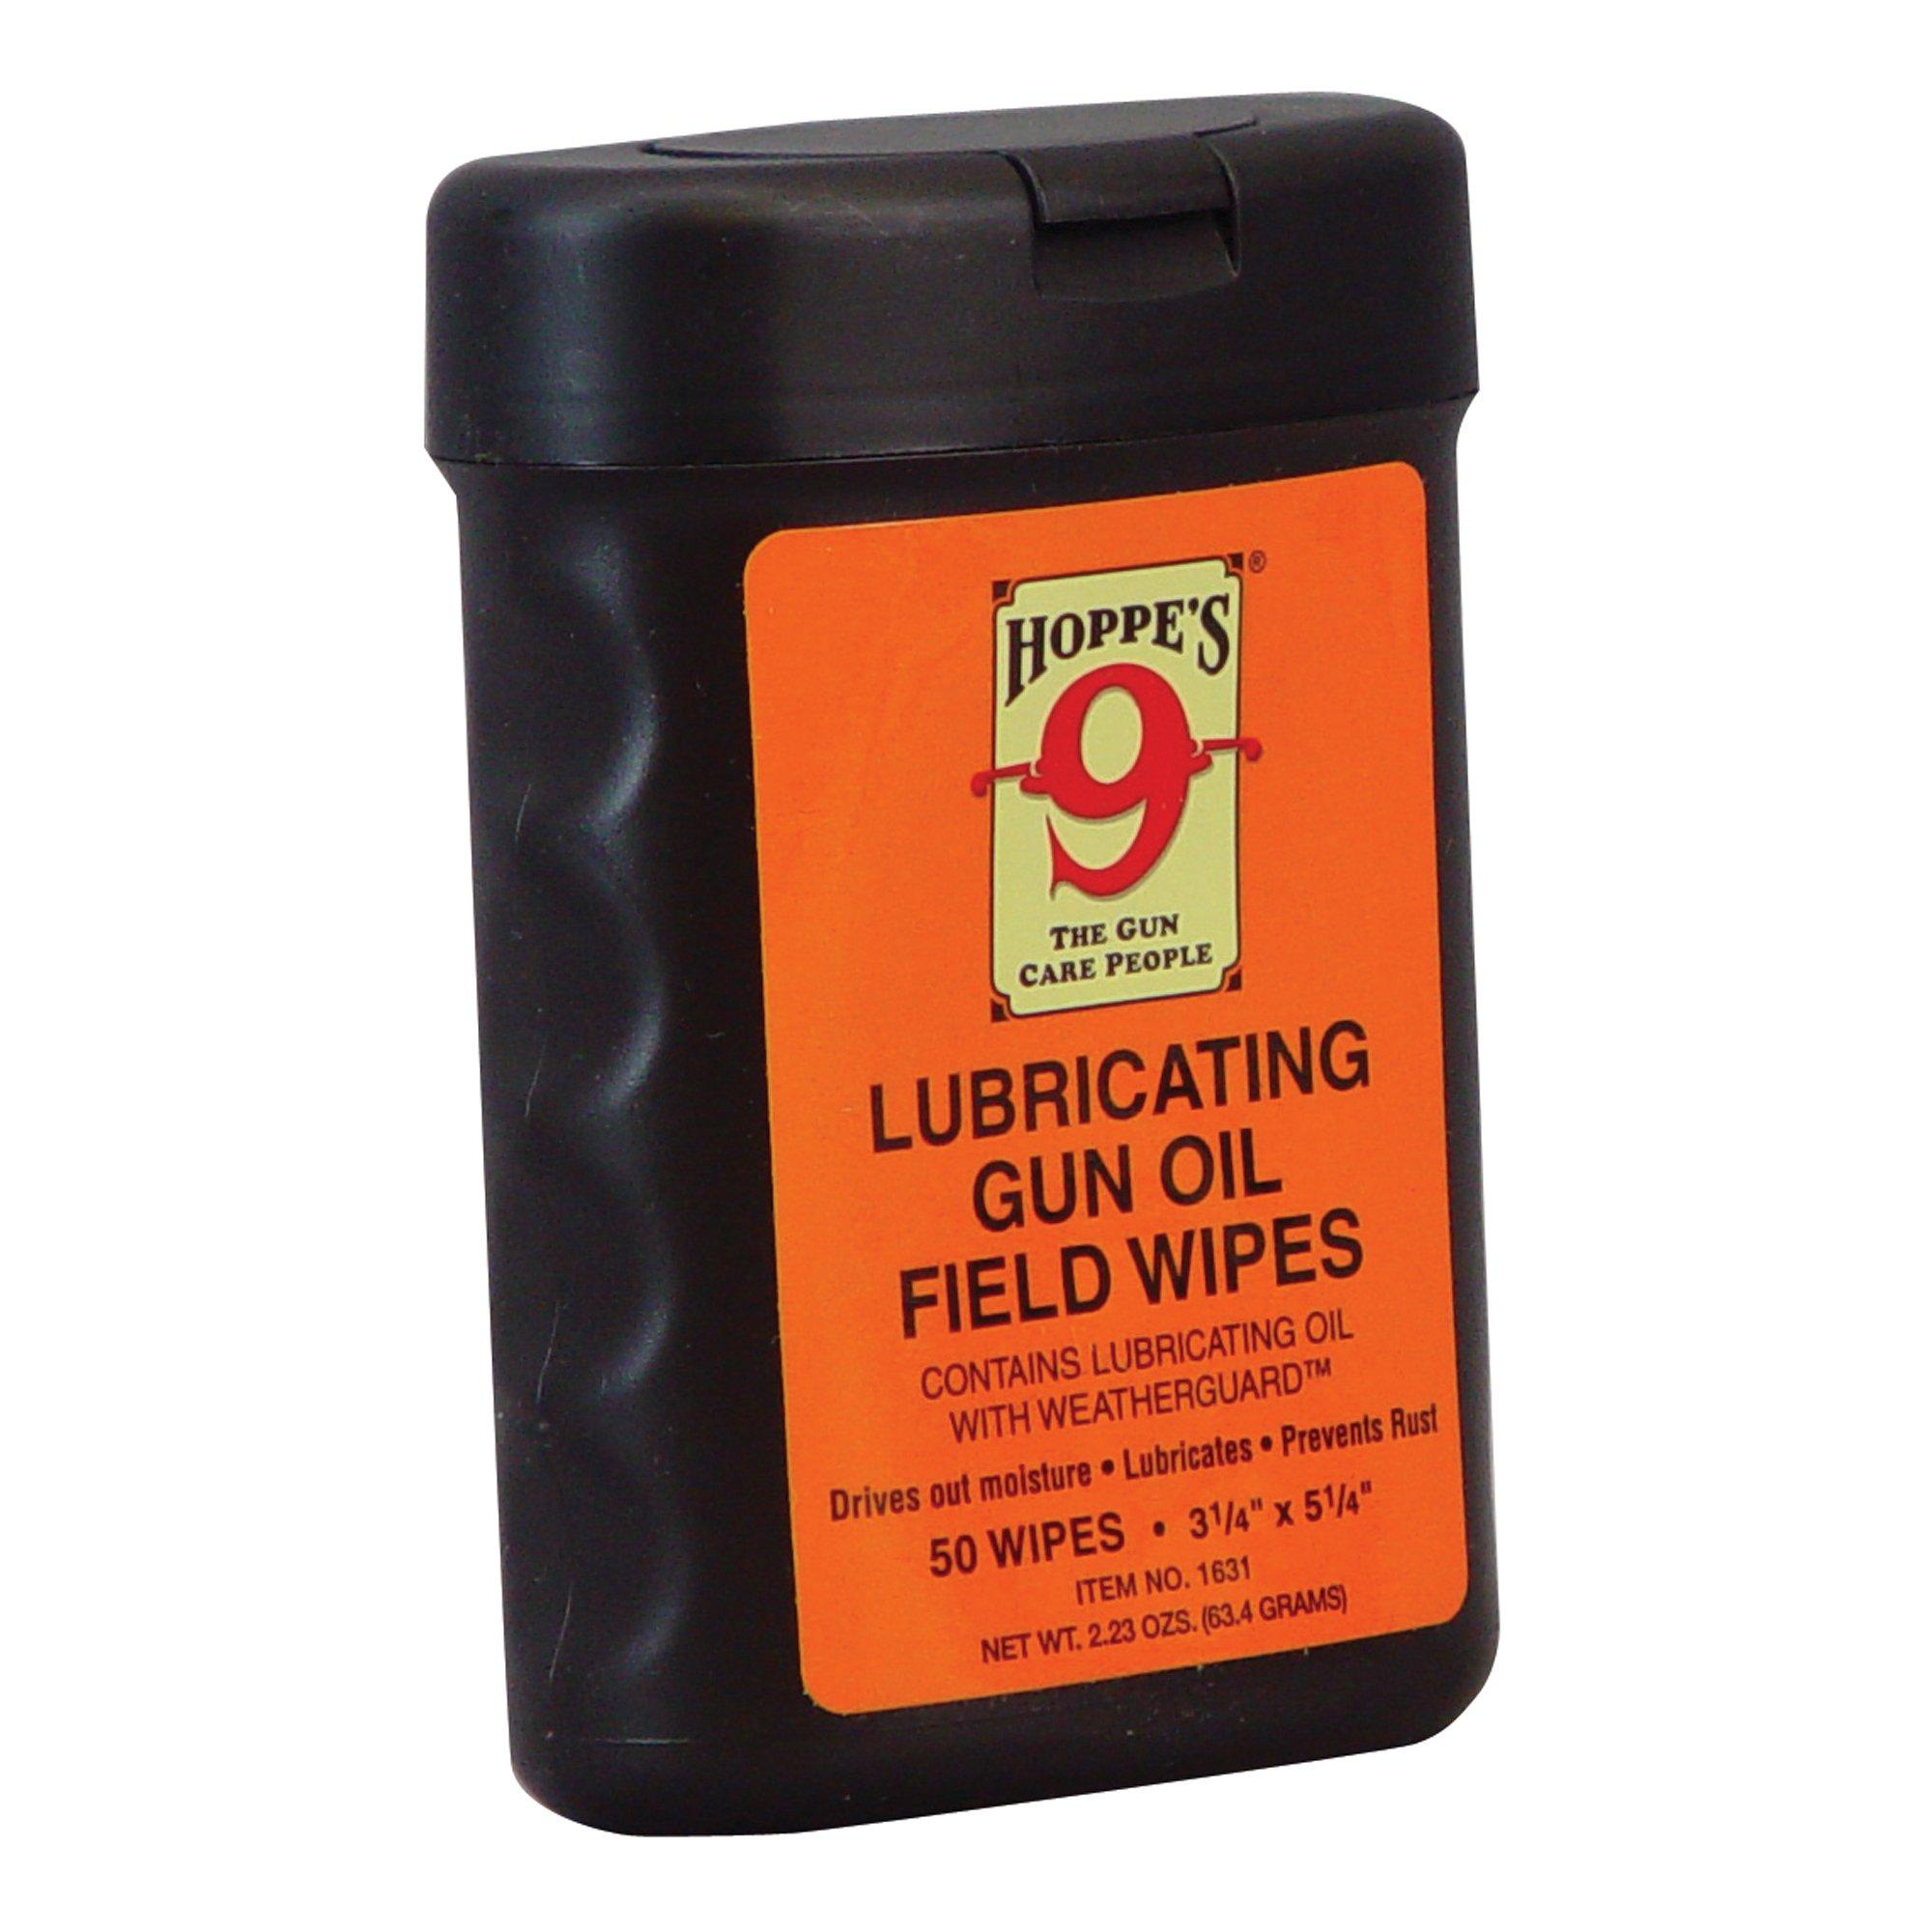 Hoppe's No. 9 Lubricating Gun Oil Field Wipes